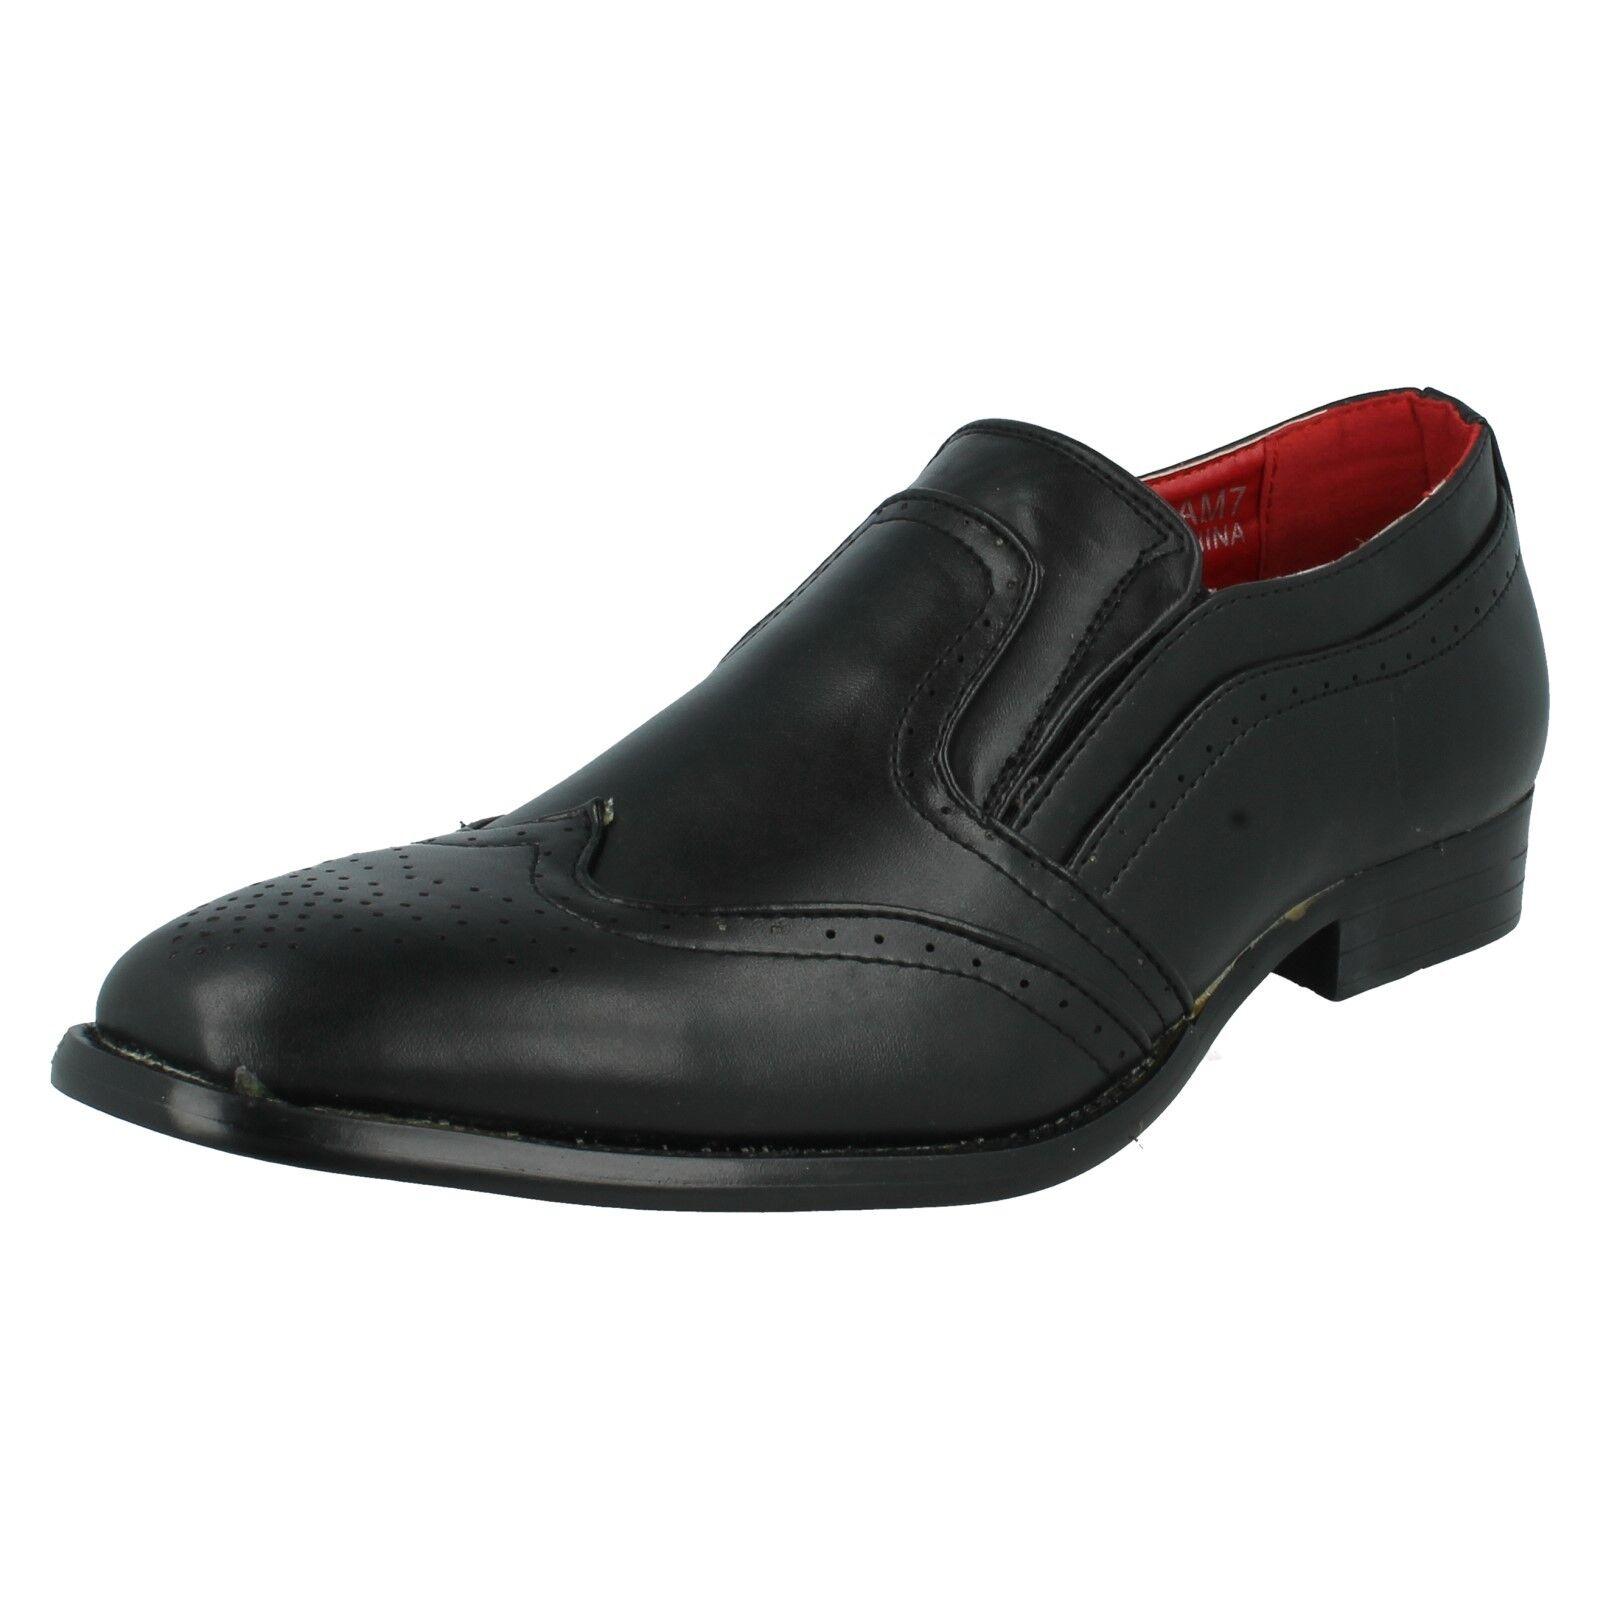 Maverick Hombre sin Cordones Sintético Plano Escudete Zapato Oxford Formal Plano Sintético e31d7d